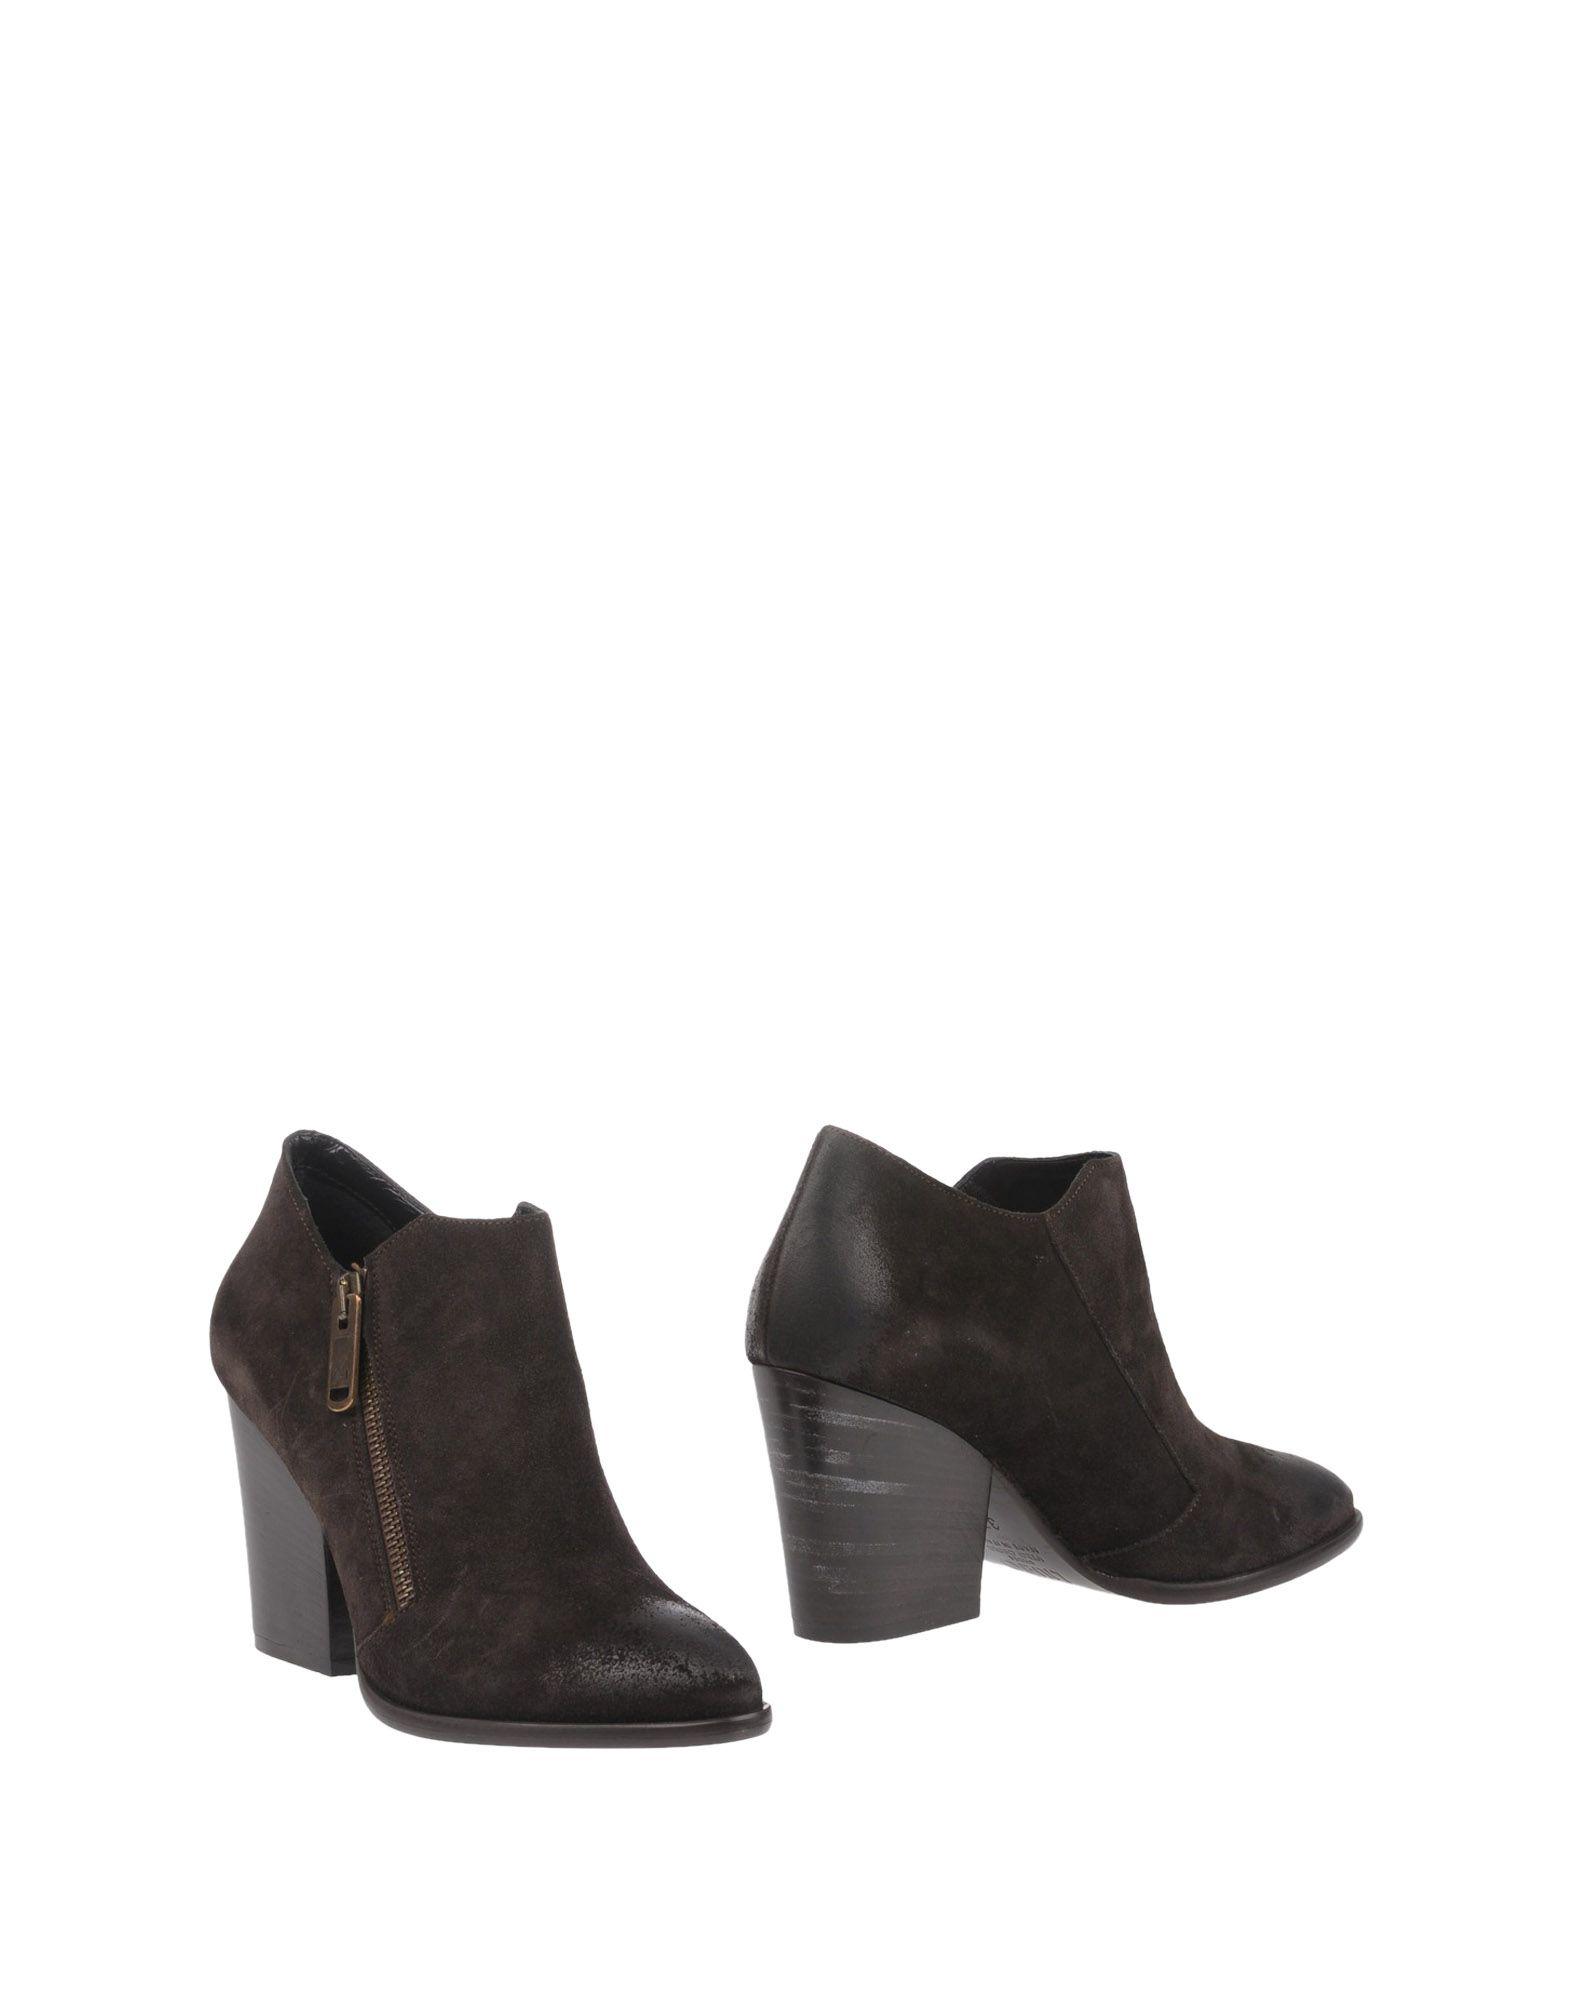 Liu •Jo Shoes Stiefelette Damen Damen Stiefelette  11211987MT Gute Qualität beliebte Schuhe 9511af